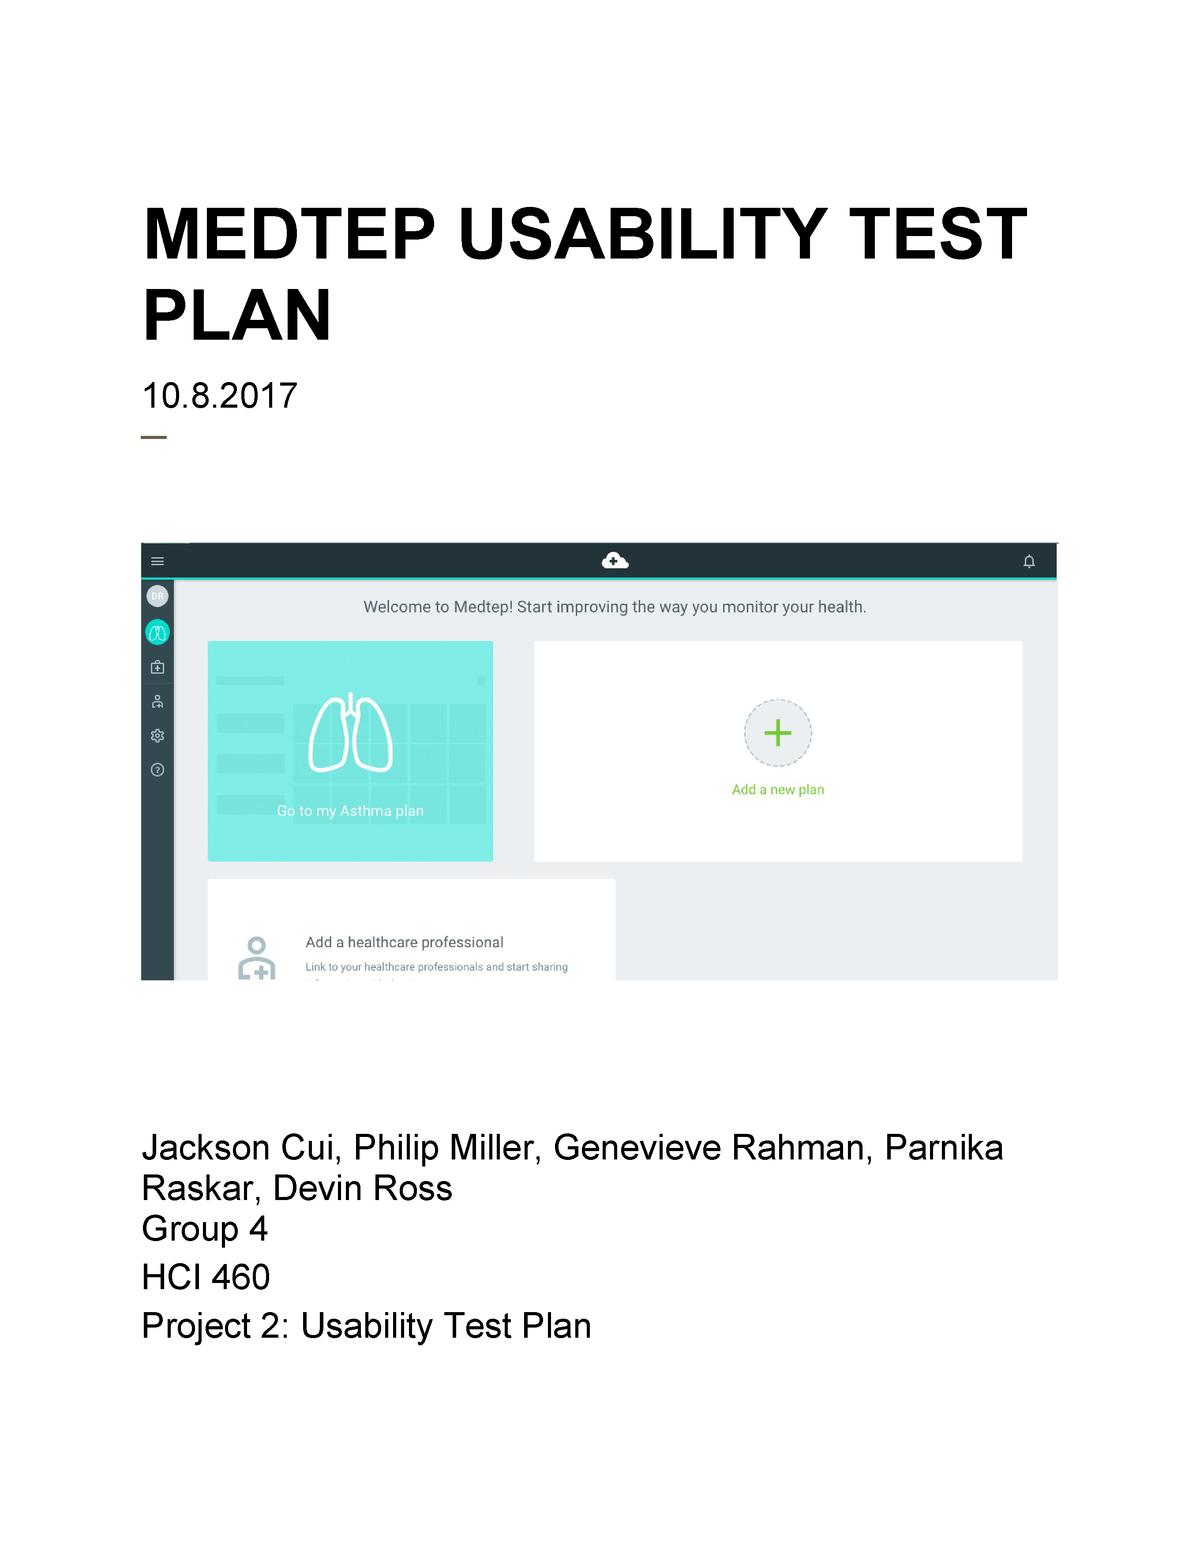 HCI460 Group 4 Project 2 - HCI 460: Usability Evaluation